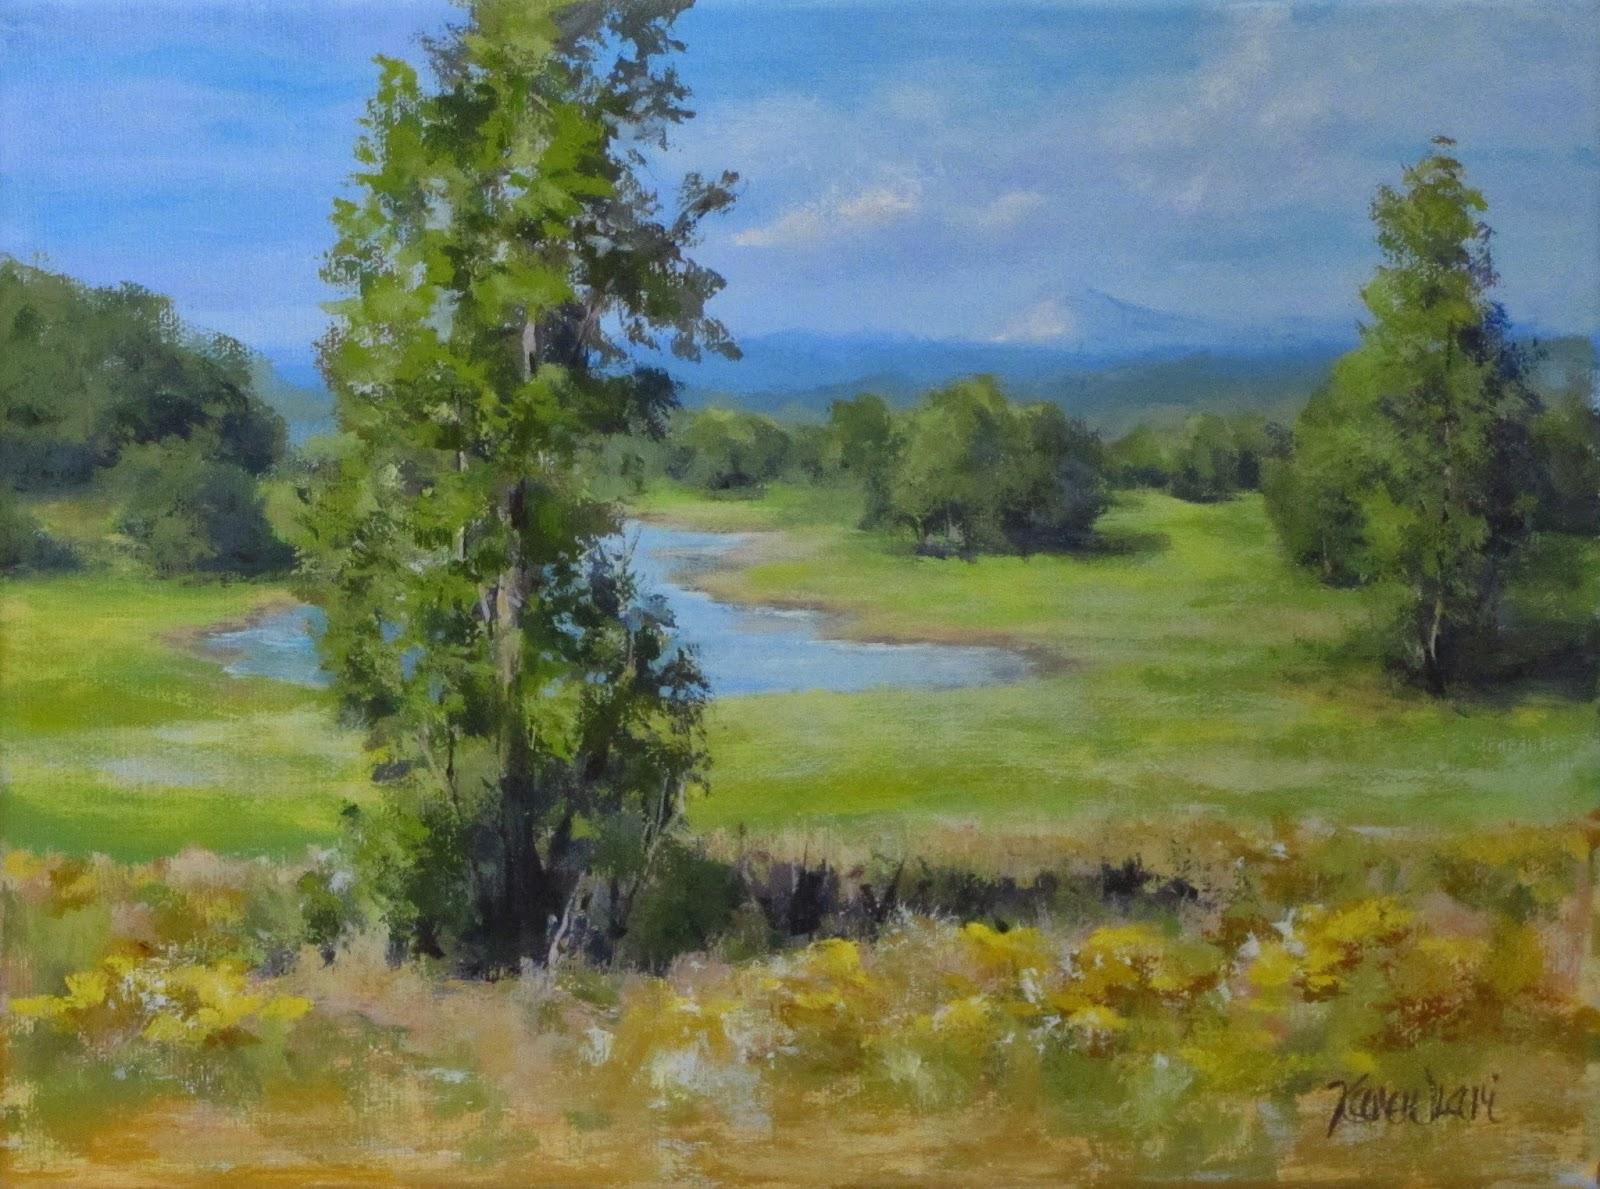 Karen Ilari Painting Summer Pond An Acrylic Landscape Tutorial Video